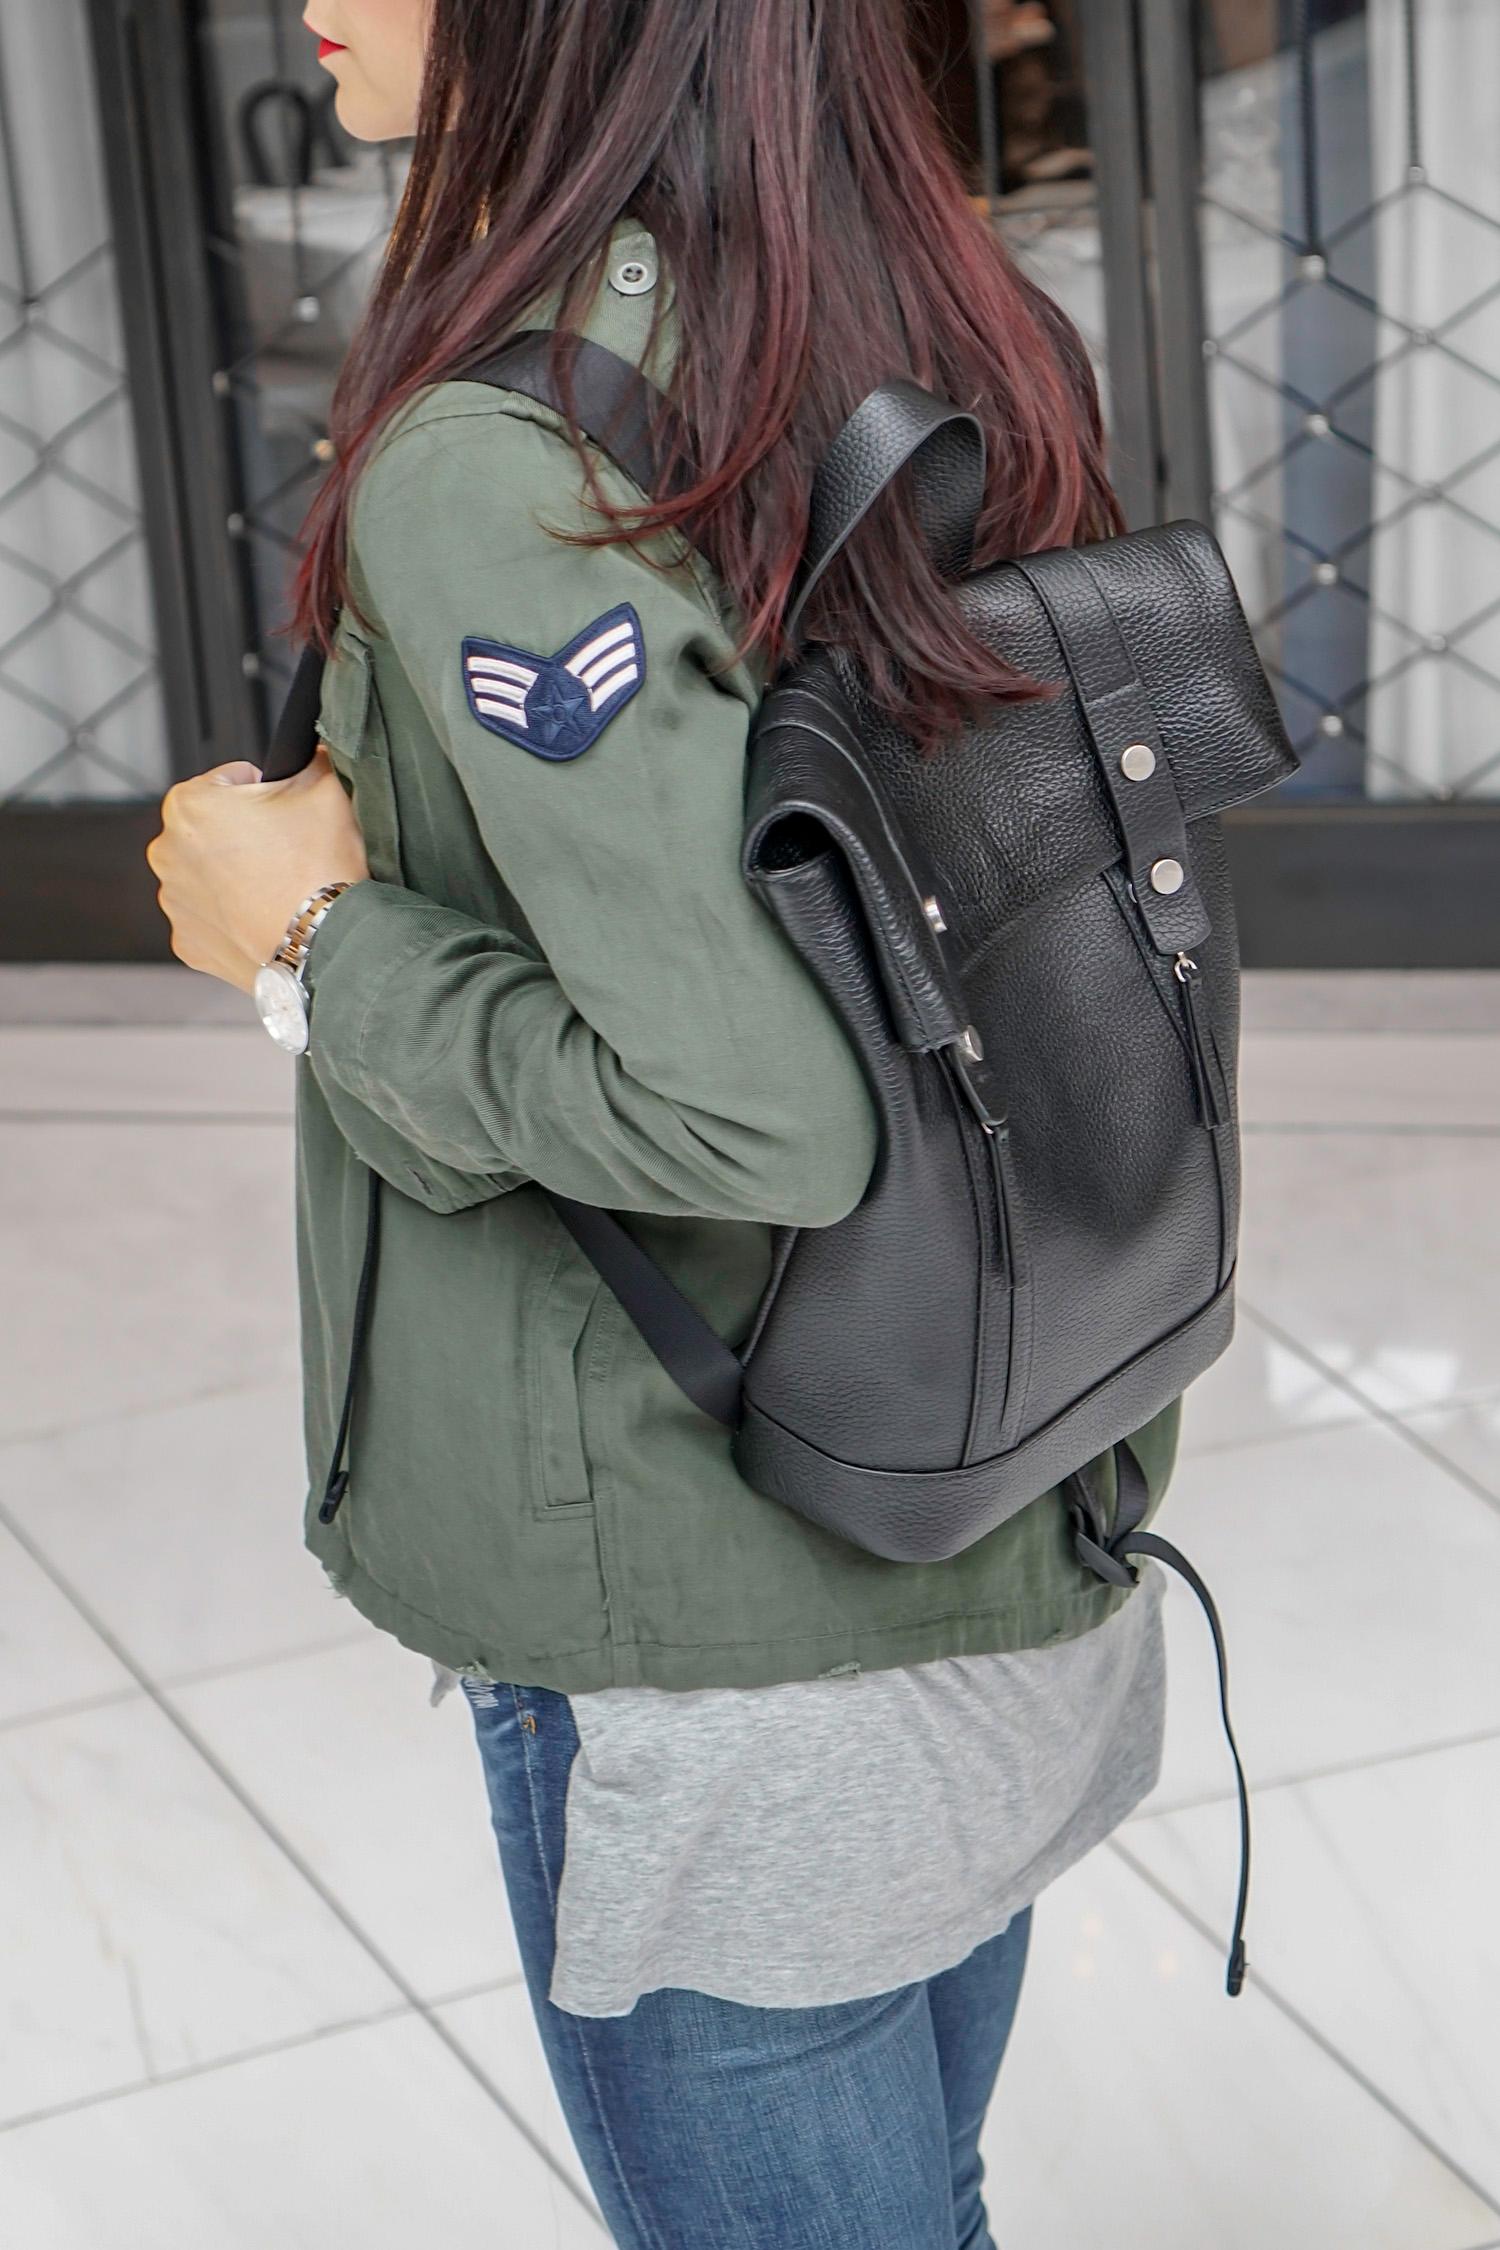 Rails Military Shirt Jacket, Treasure & Bond Backpack, Vans Old School Sneakers, Vans Camo